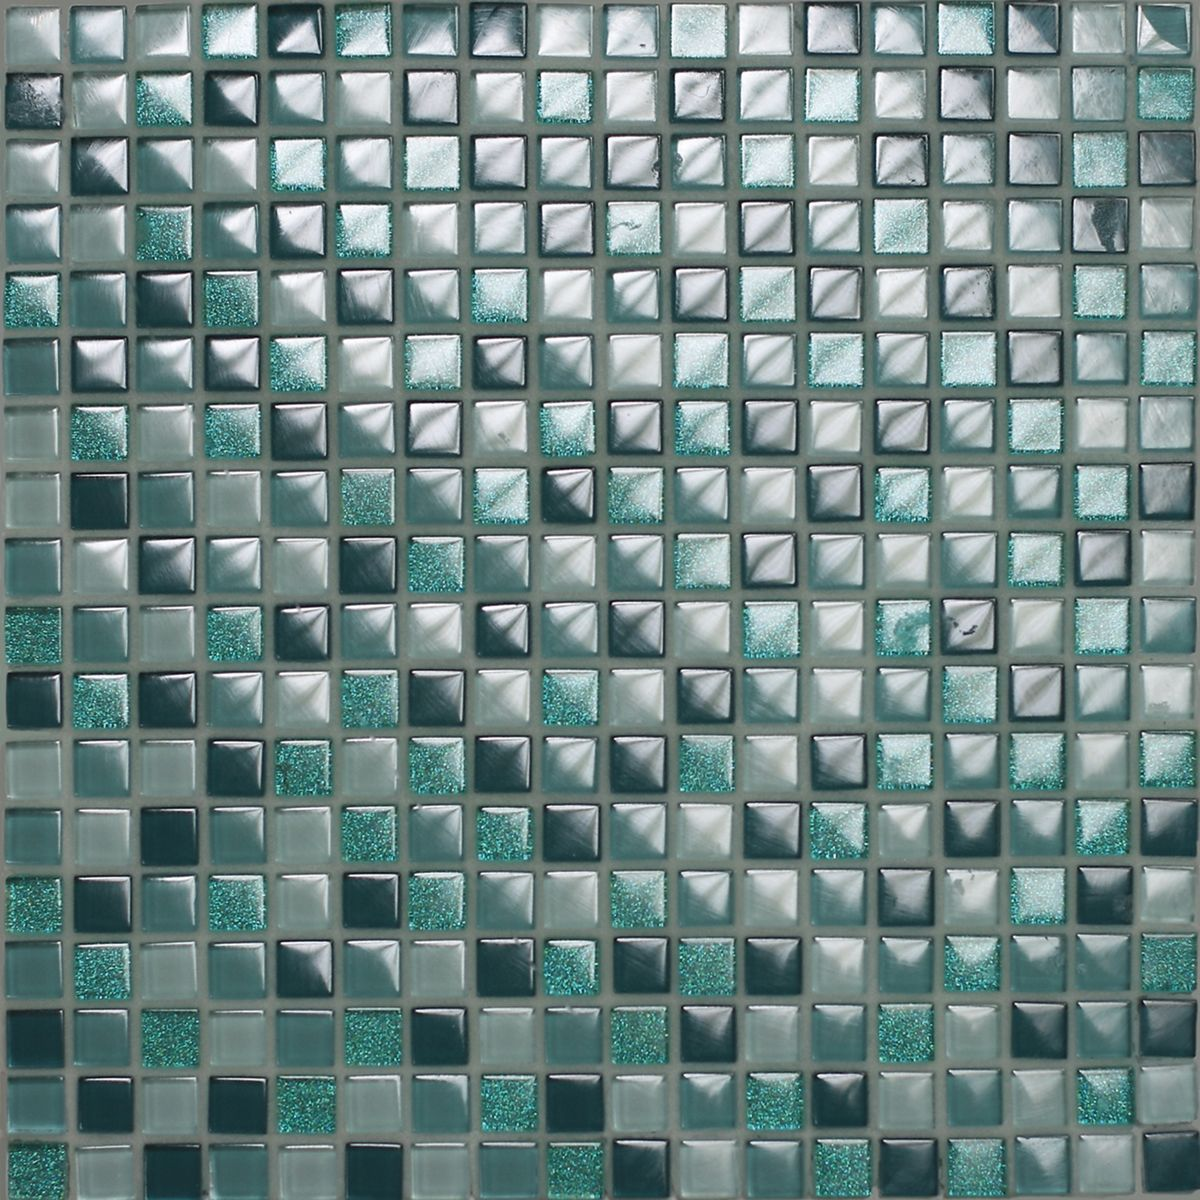 Piastrelle bagno mosaico verde piastrelle bagno mosaico verde with piastrelle bagno mosaico - Piastrelle tipo mosaico ...